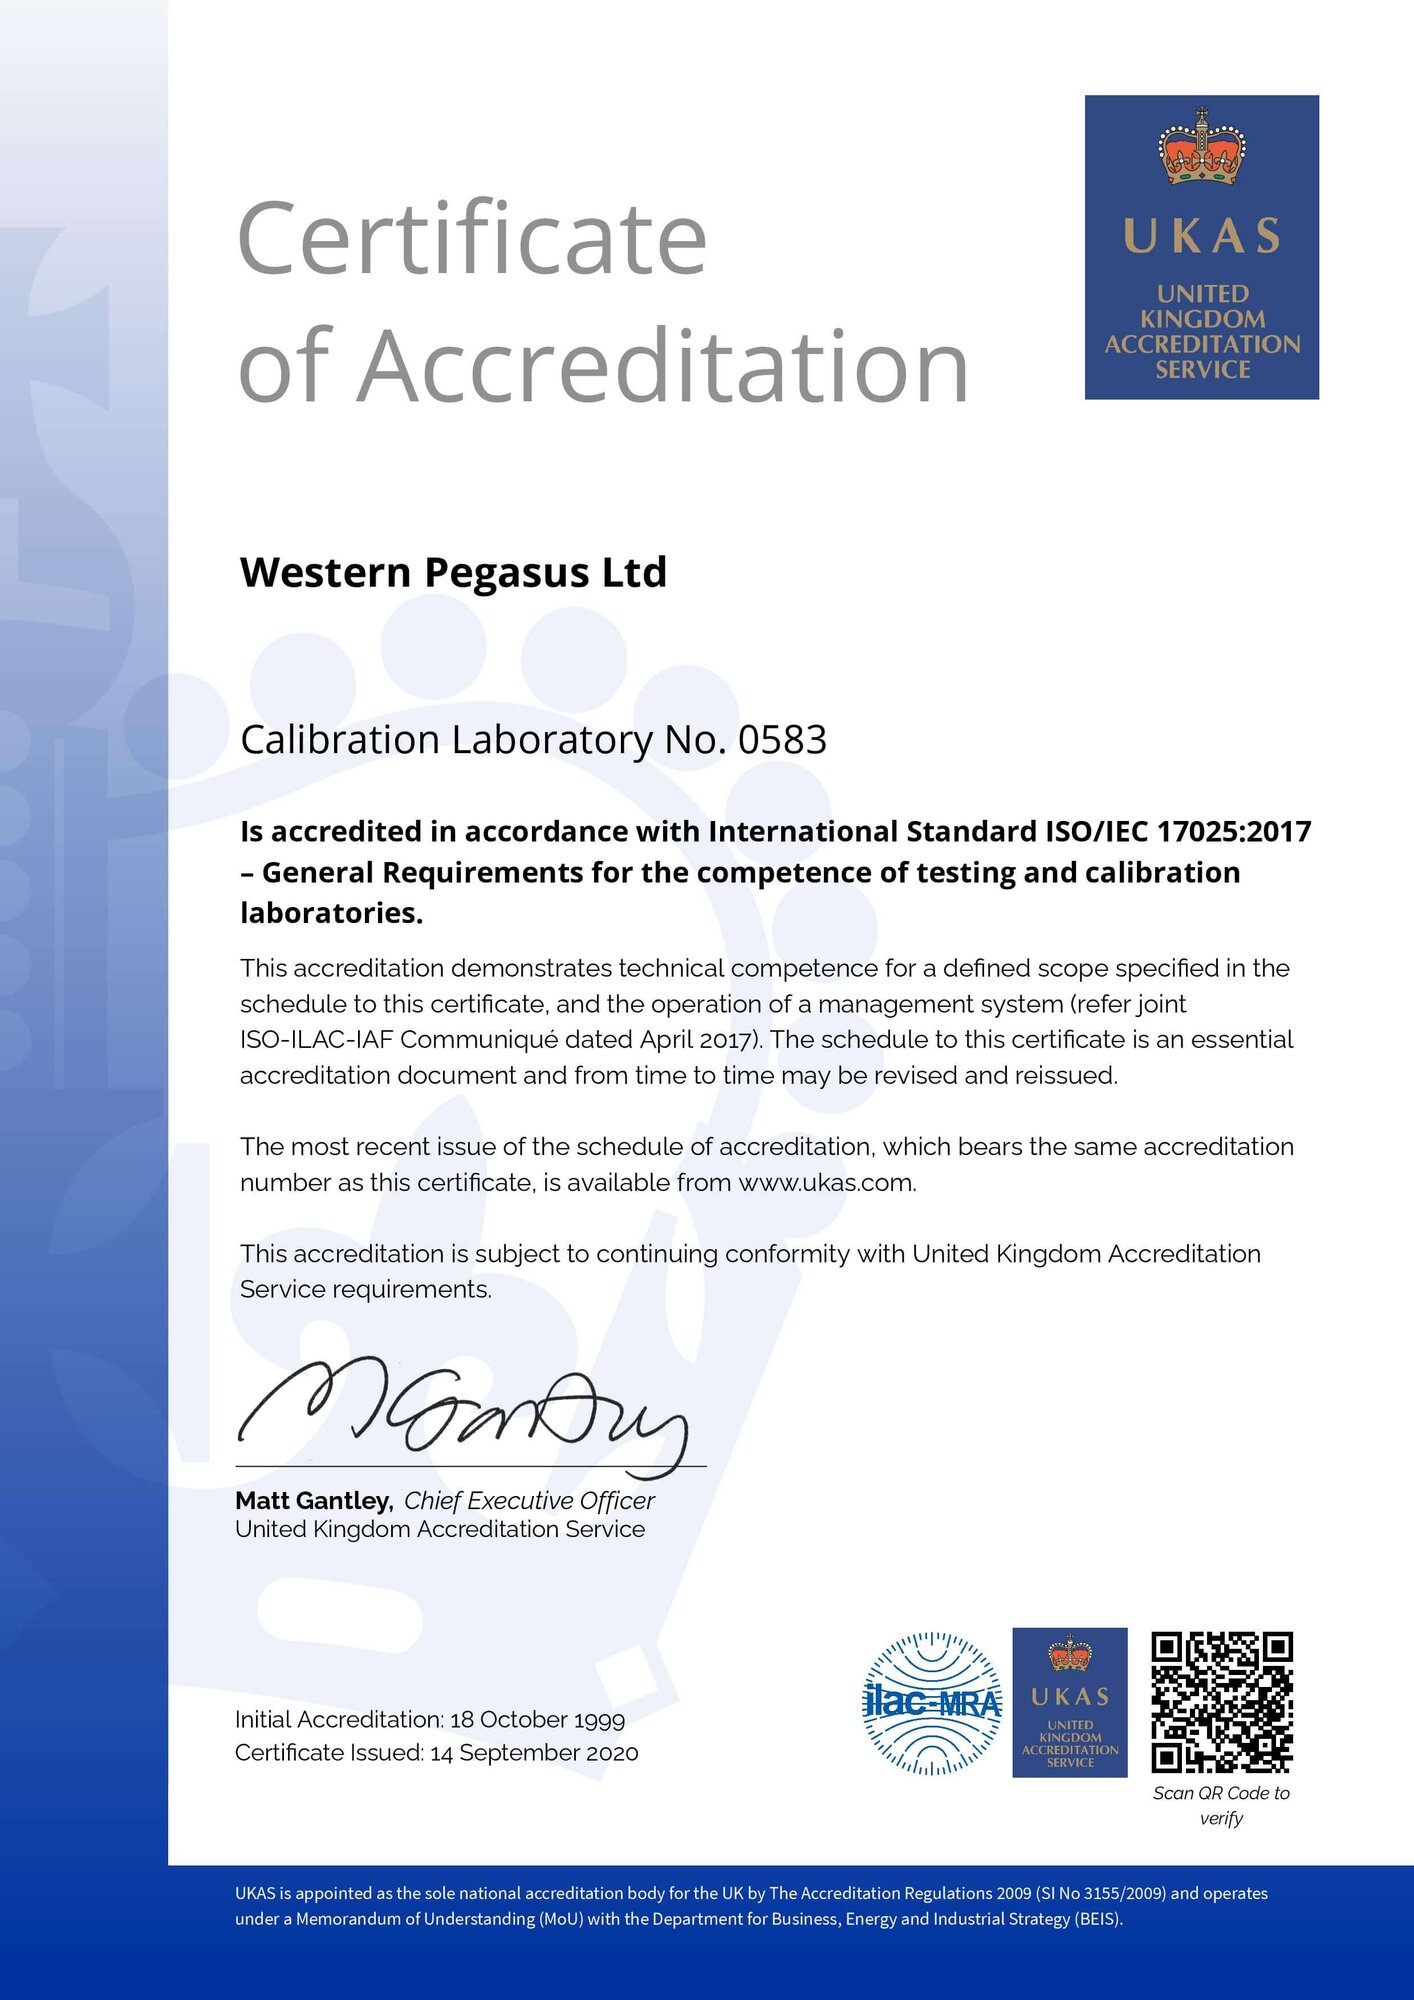 UKAS – ISO Certified rsz western pegasus ukas 17025 2017 certificate page 0011